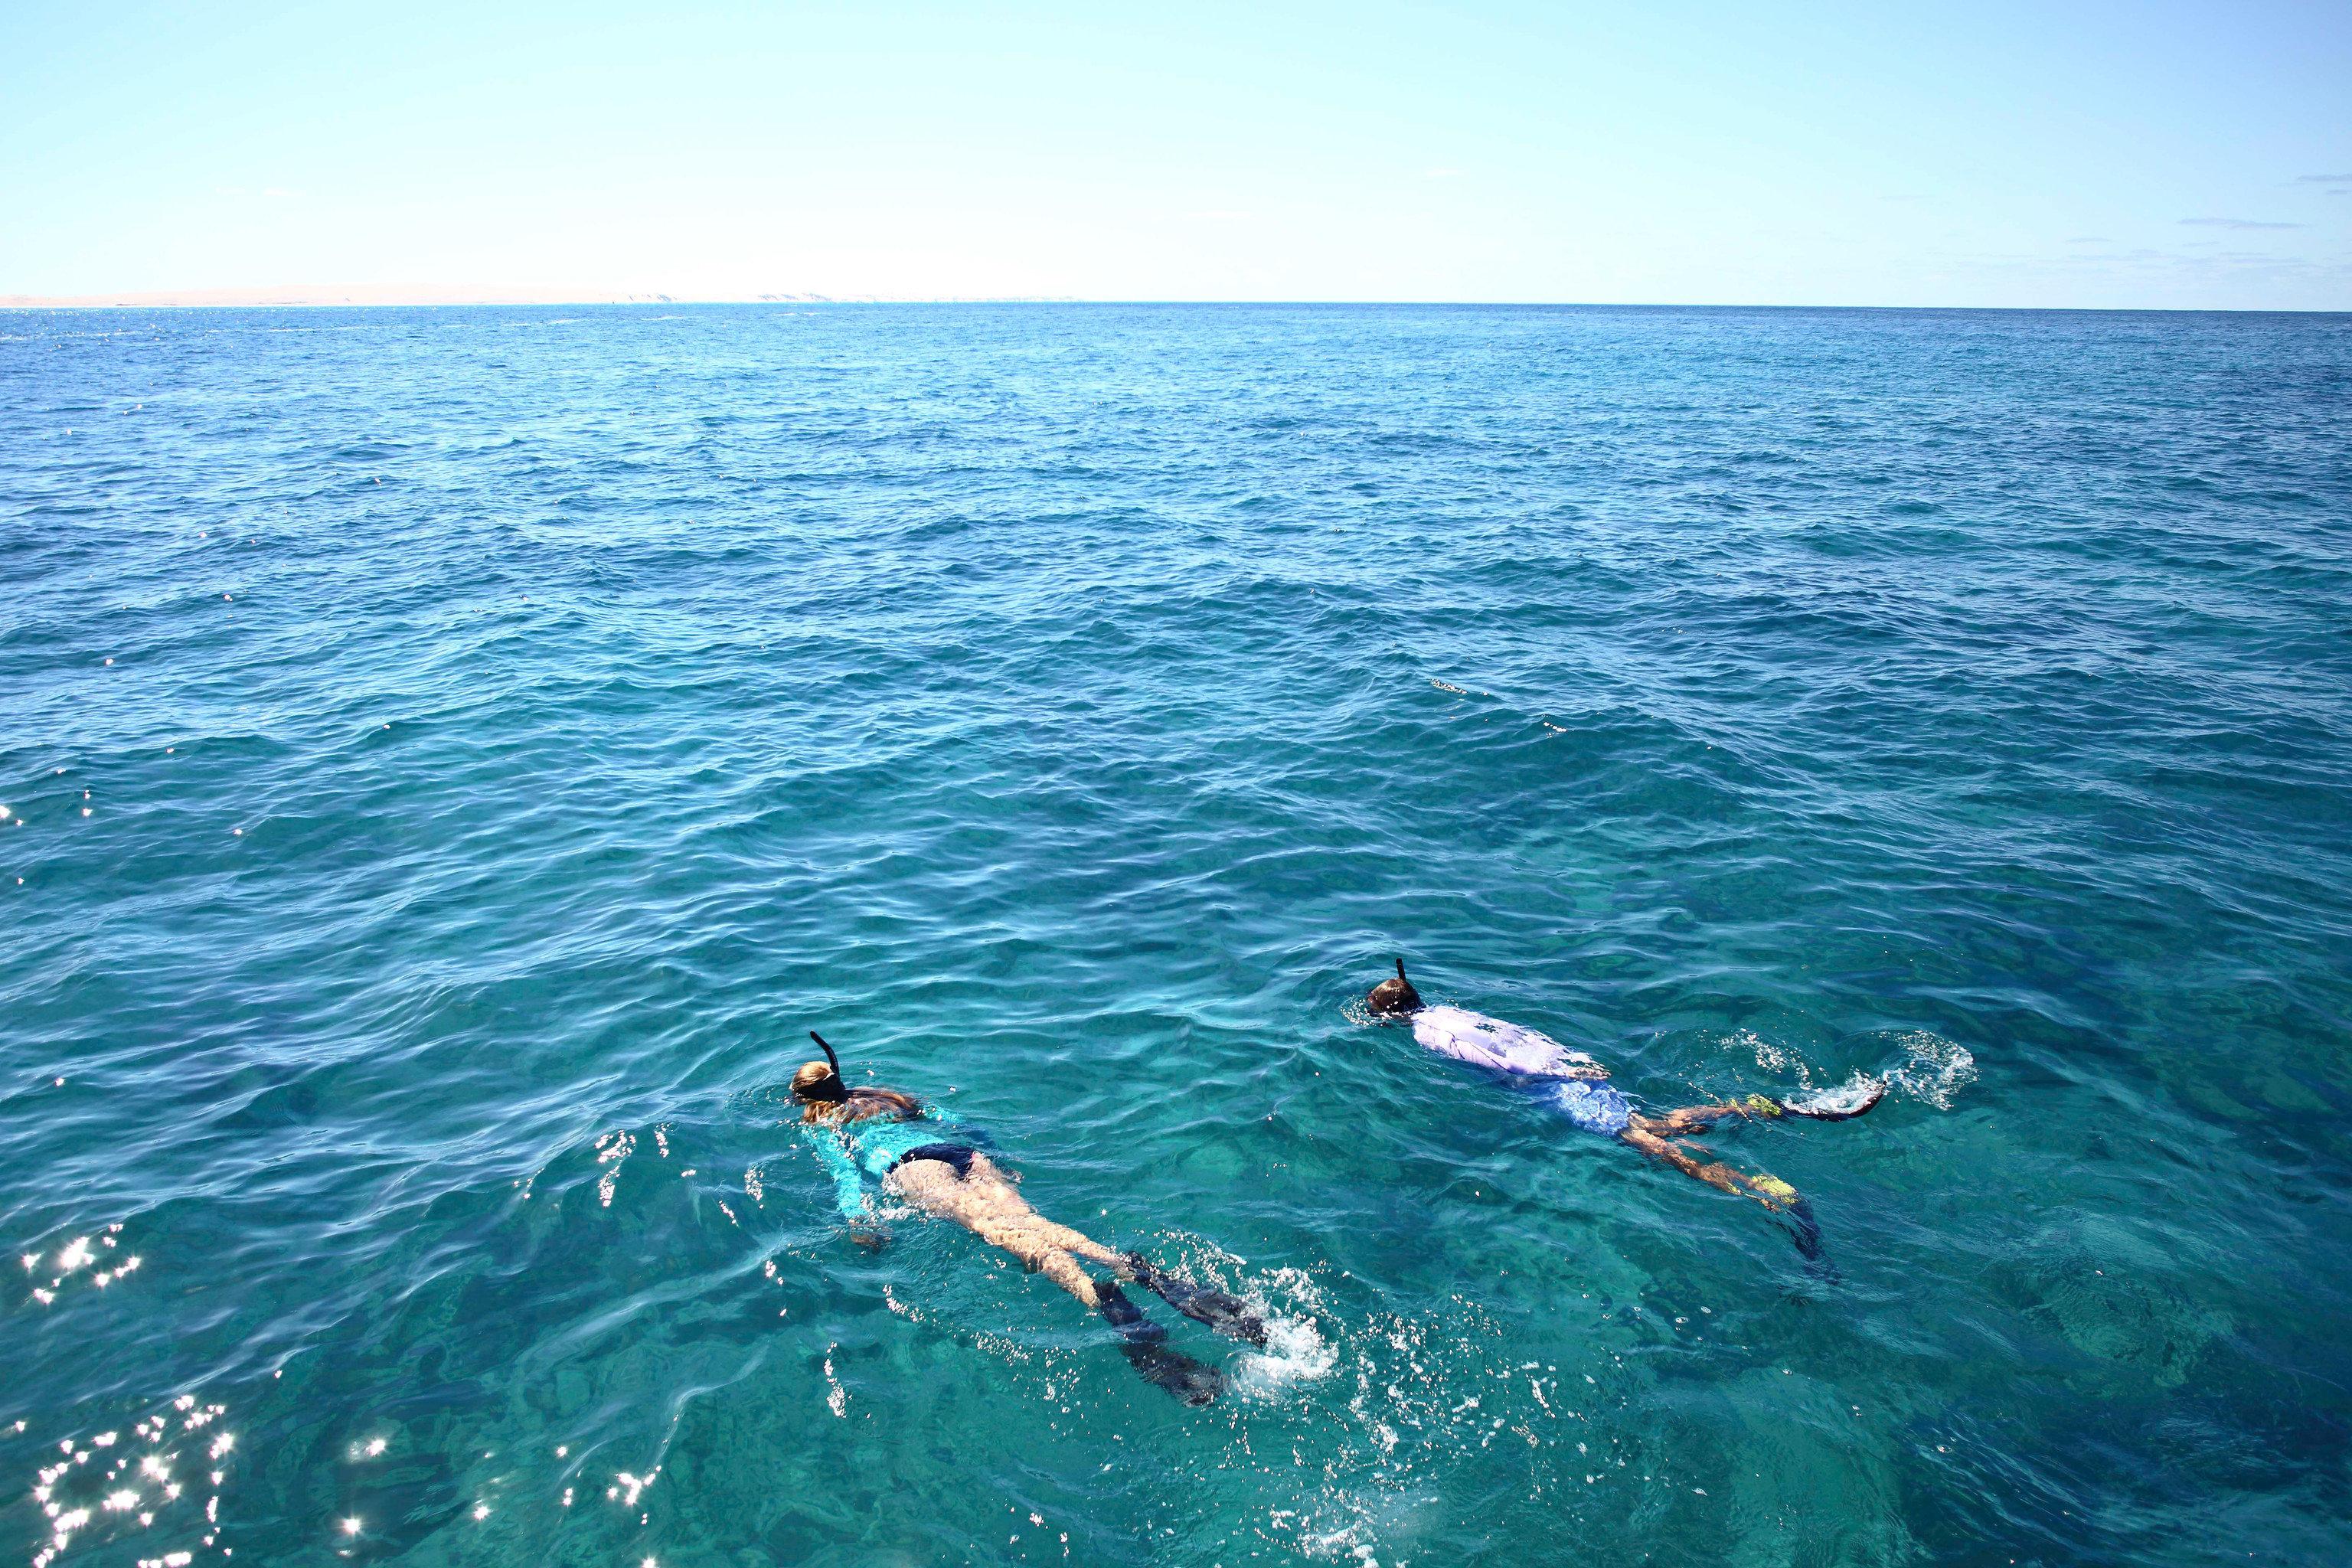 water sky Sport water sport Ocean riding marine biology Sea sports wind wave wave surfing swimming cape